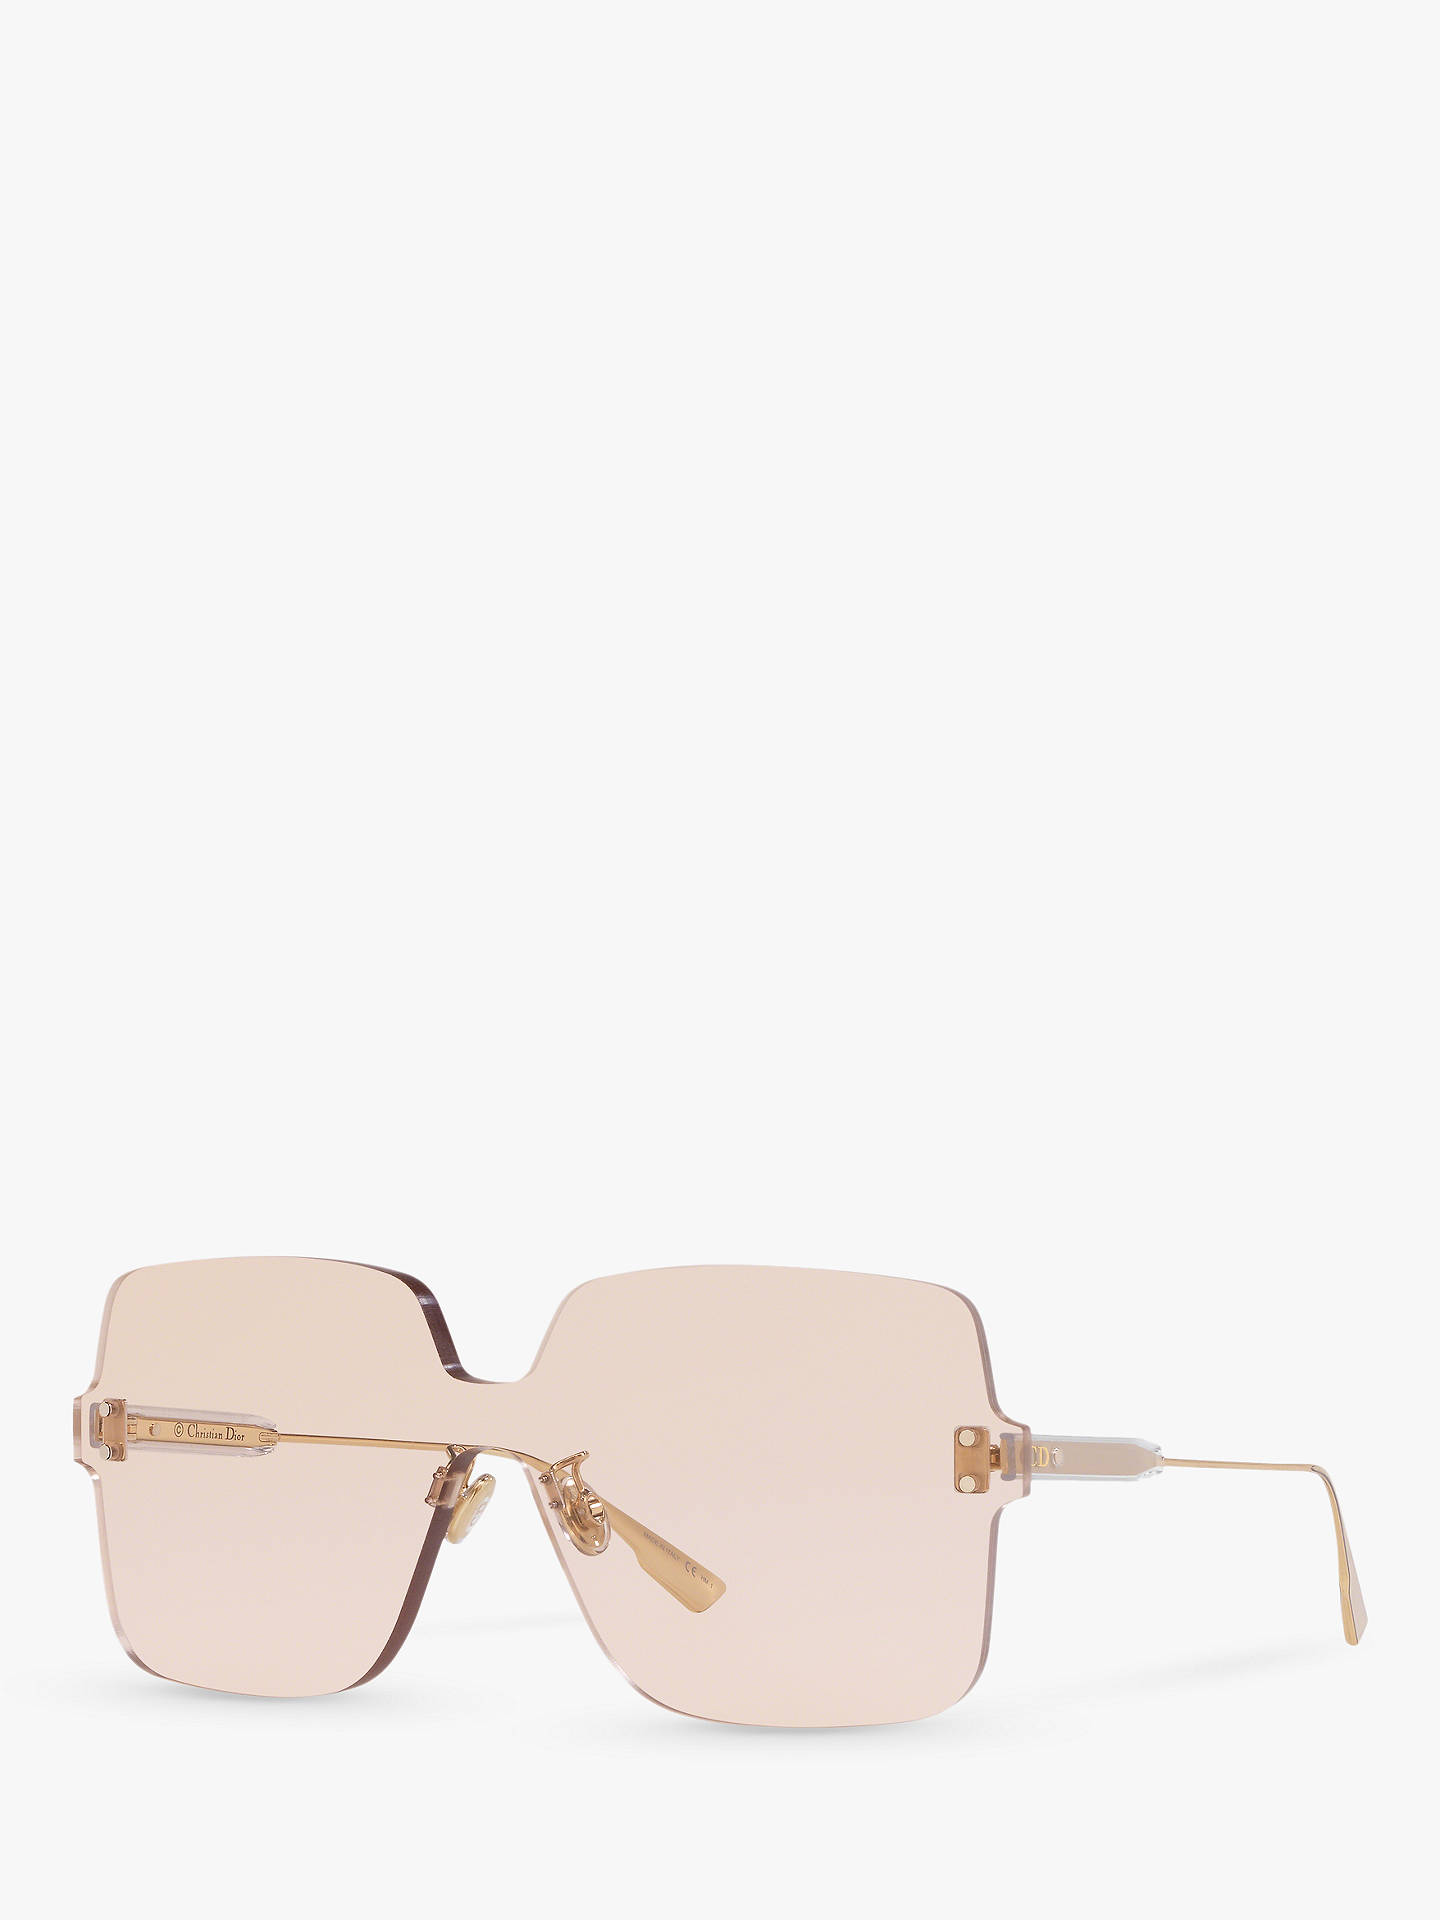 ad2f5473e18 Dior Diorcolourquake1 Women s Rectangular Sunglasses at John Lewis ...